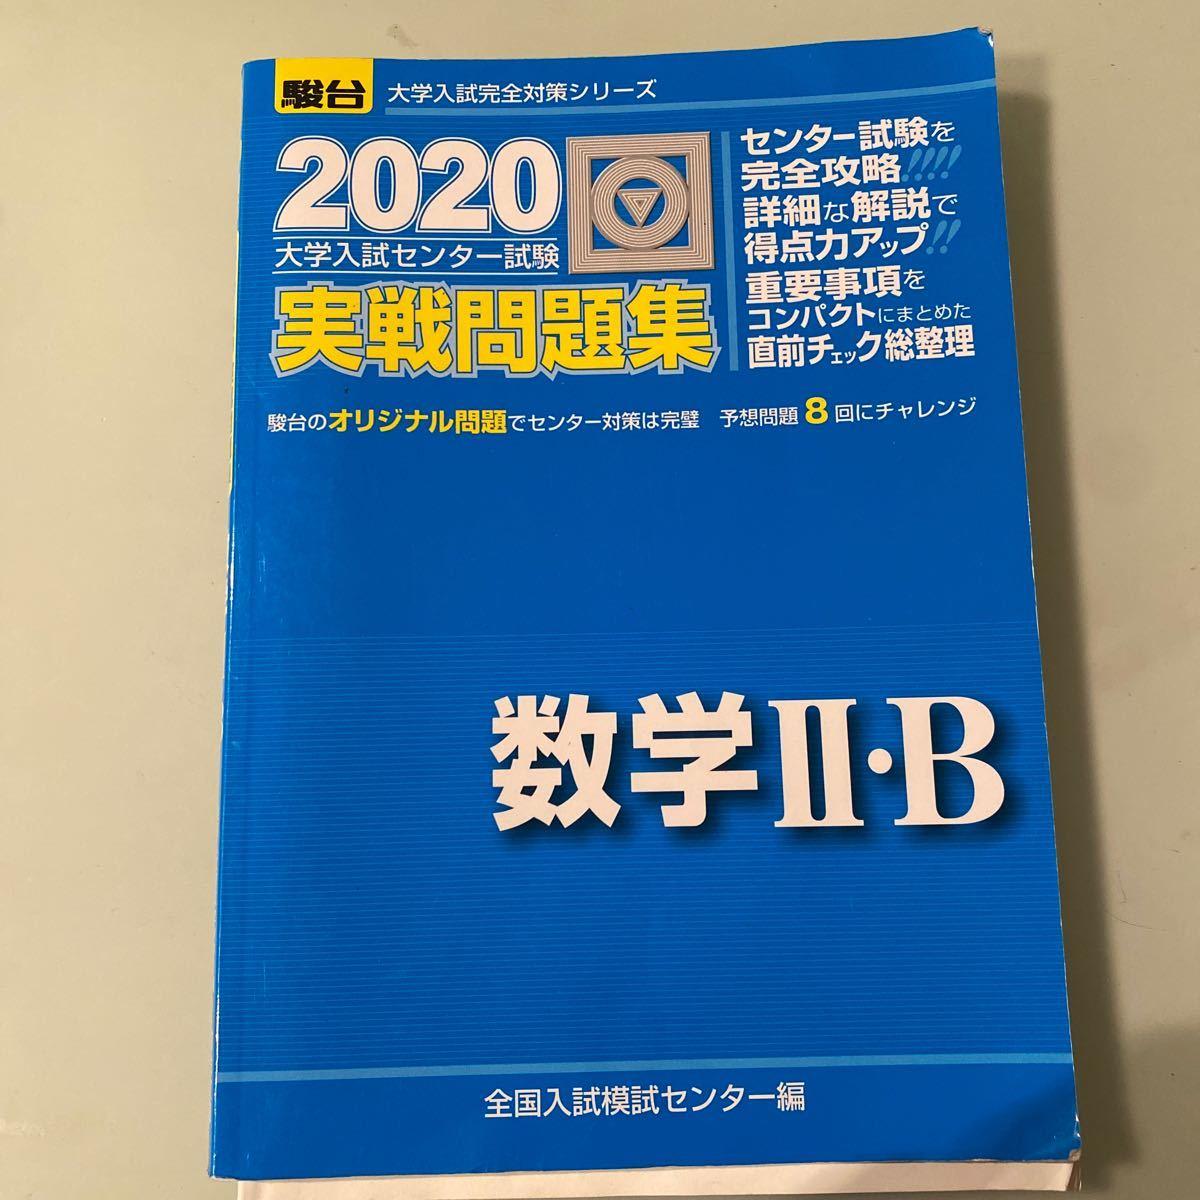 大学入試センター試験実戦問題集数学II・B 2020年